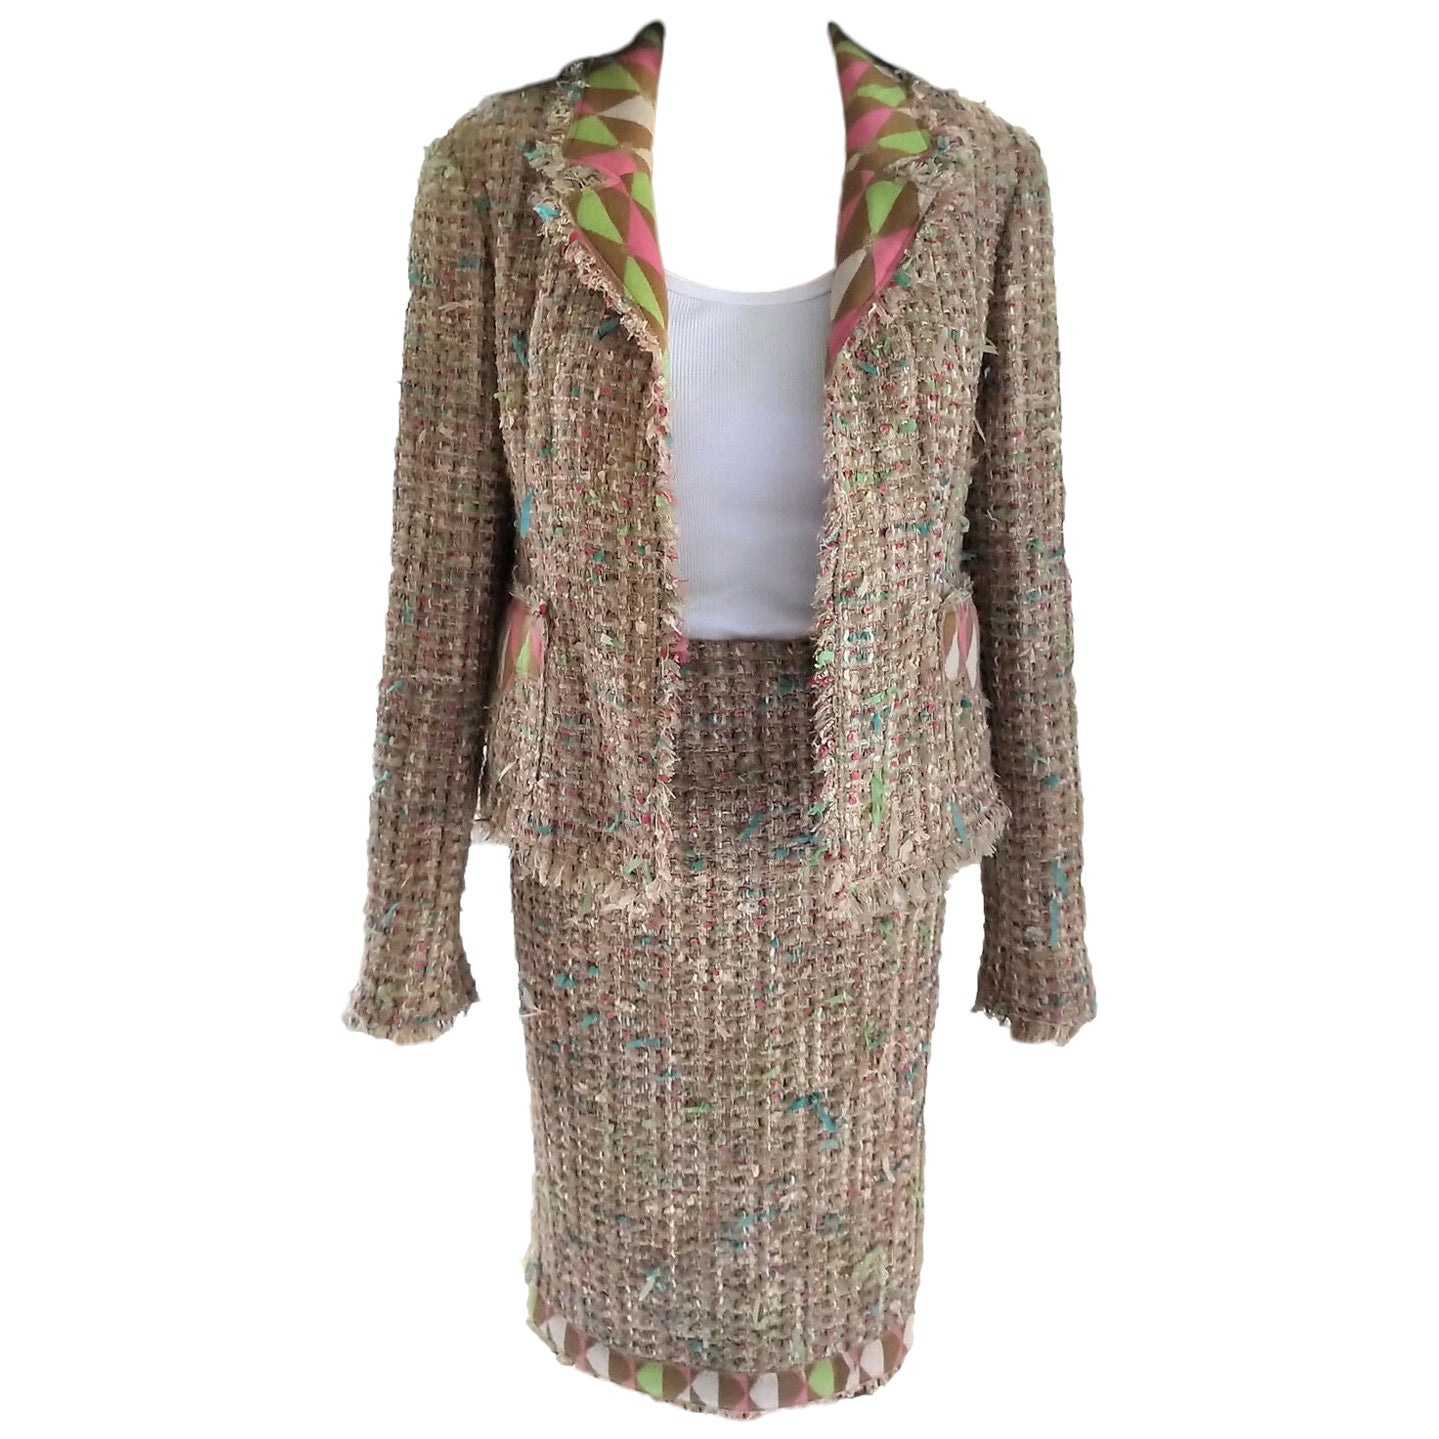 Chanel 2004 04A Nude-Beige Fantasy Tweed Sequin Jacket & Skirt Suit FR 38/ US 6